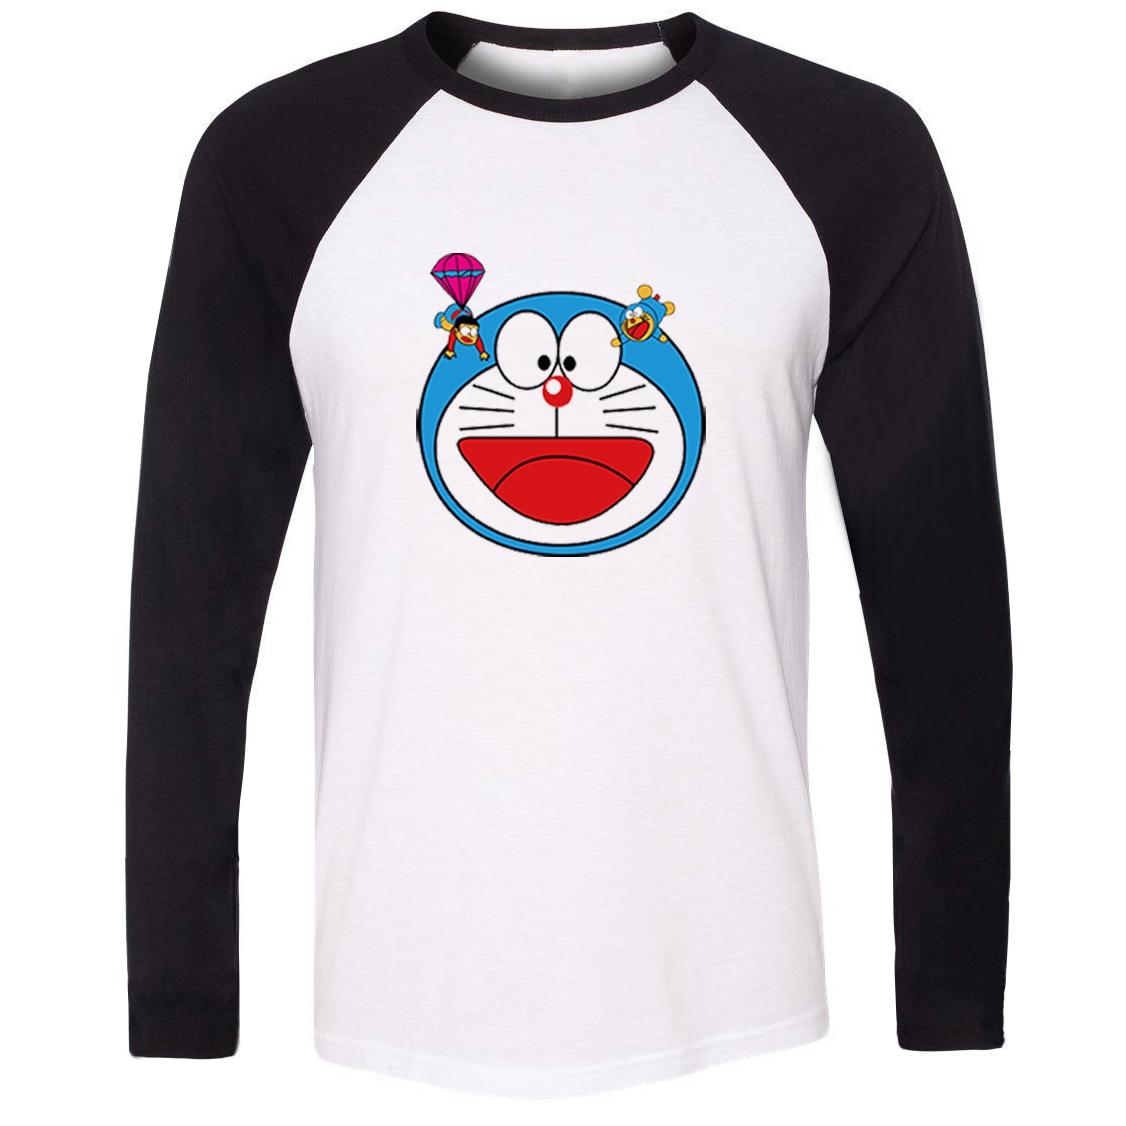 US $12 99 OFF IDzn Uni Spring Autumn Jepang Kartun Doraemon Nobi Nobita Pola T Shirt Kasual Patchwork Panjang Lengan Kaos Pria Kemeja Pria